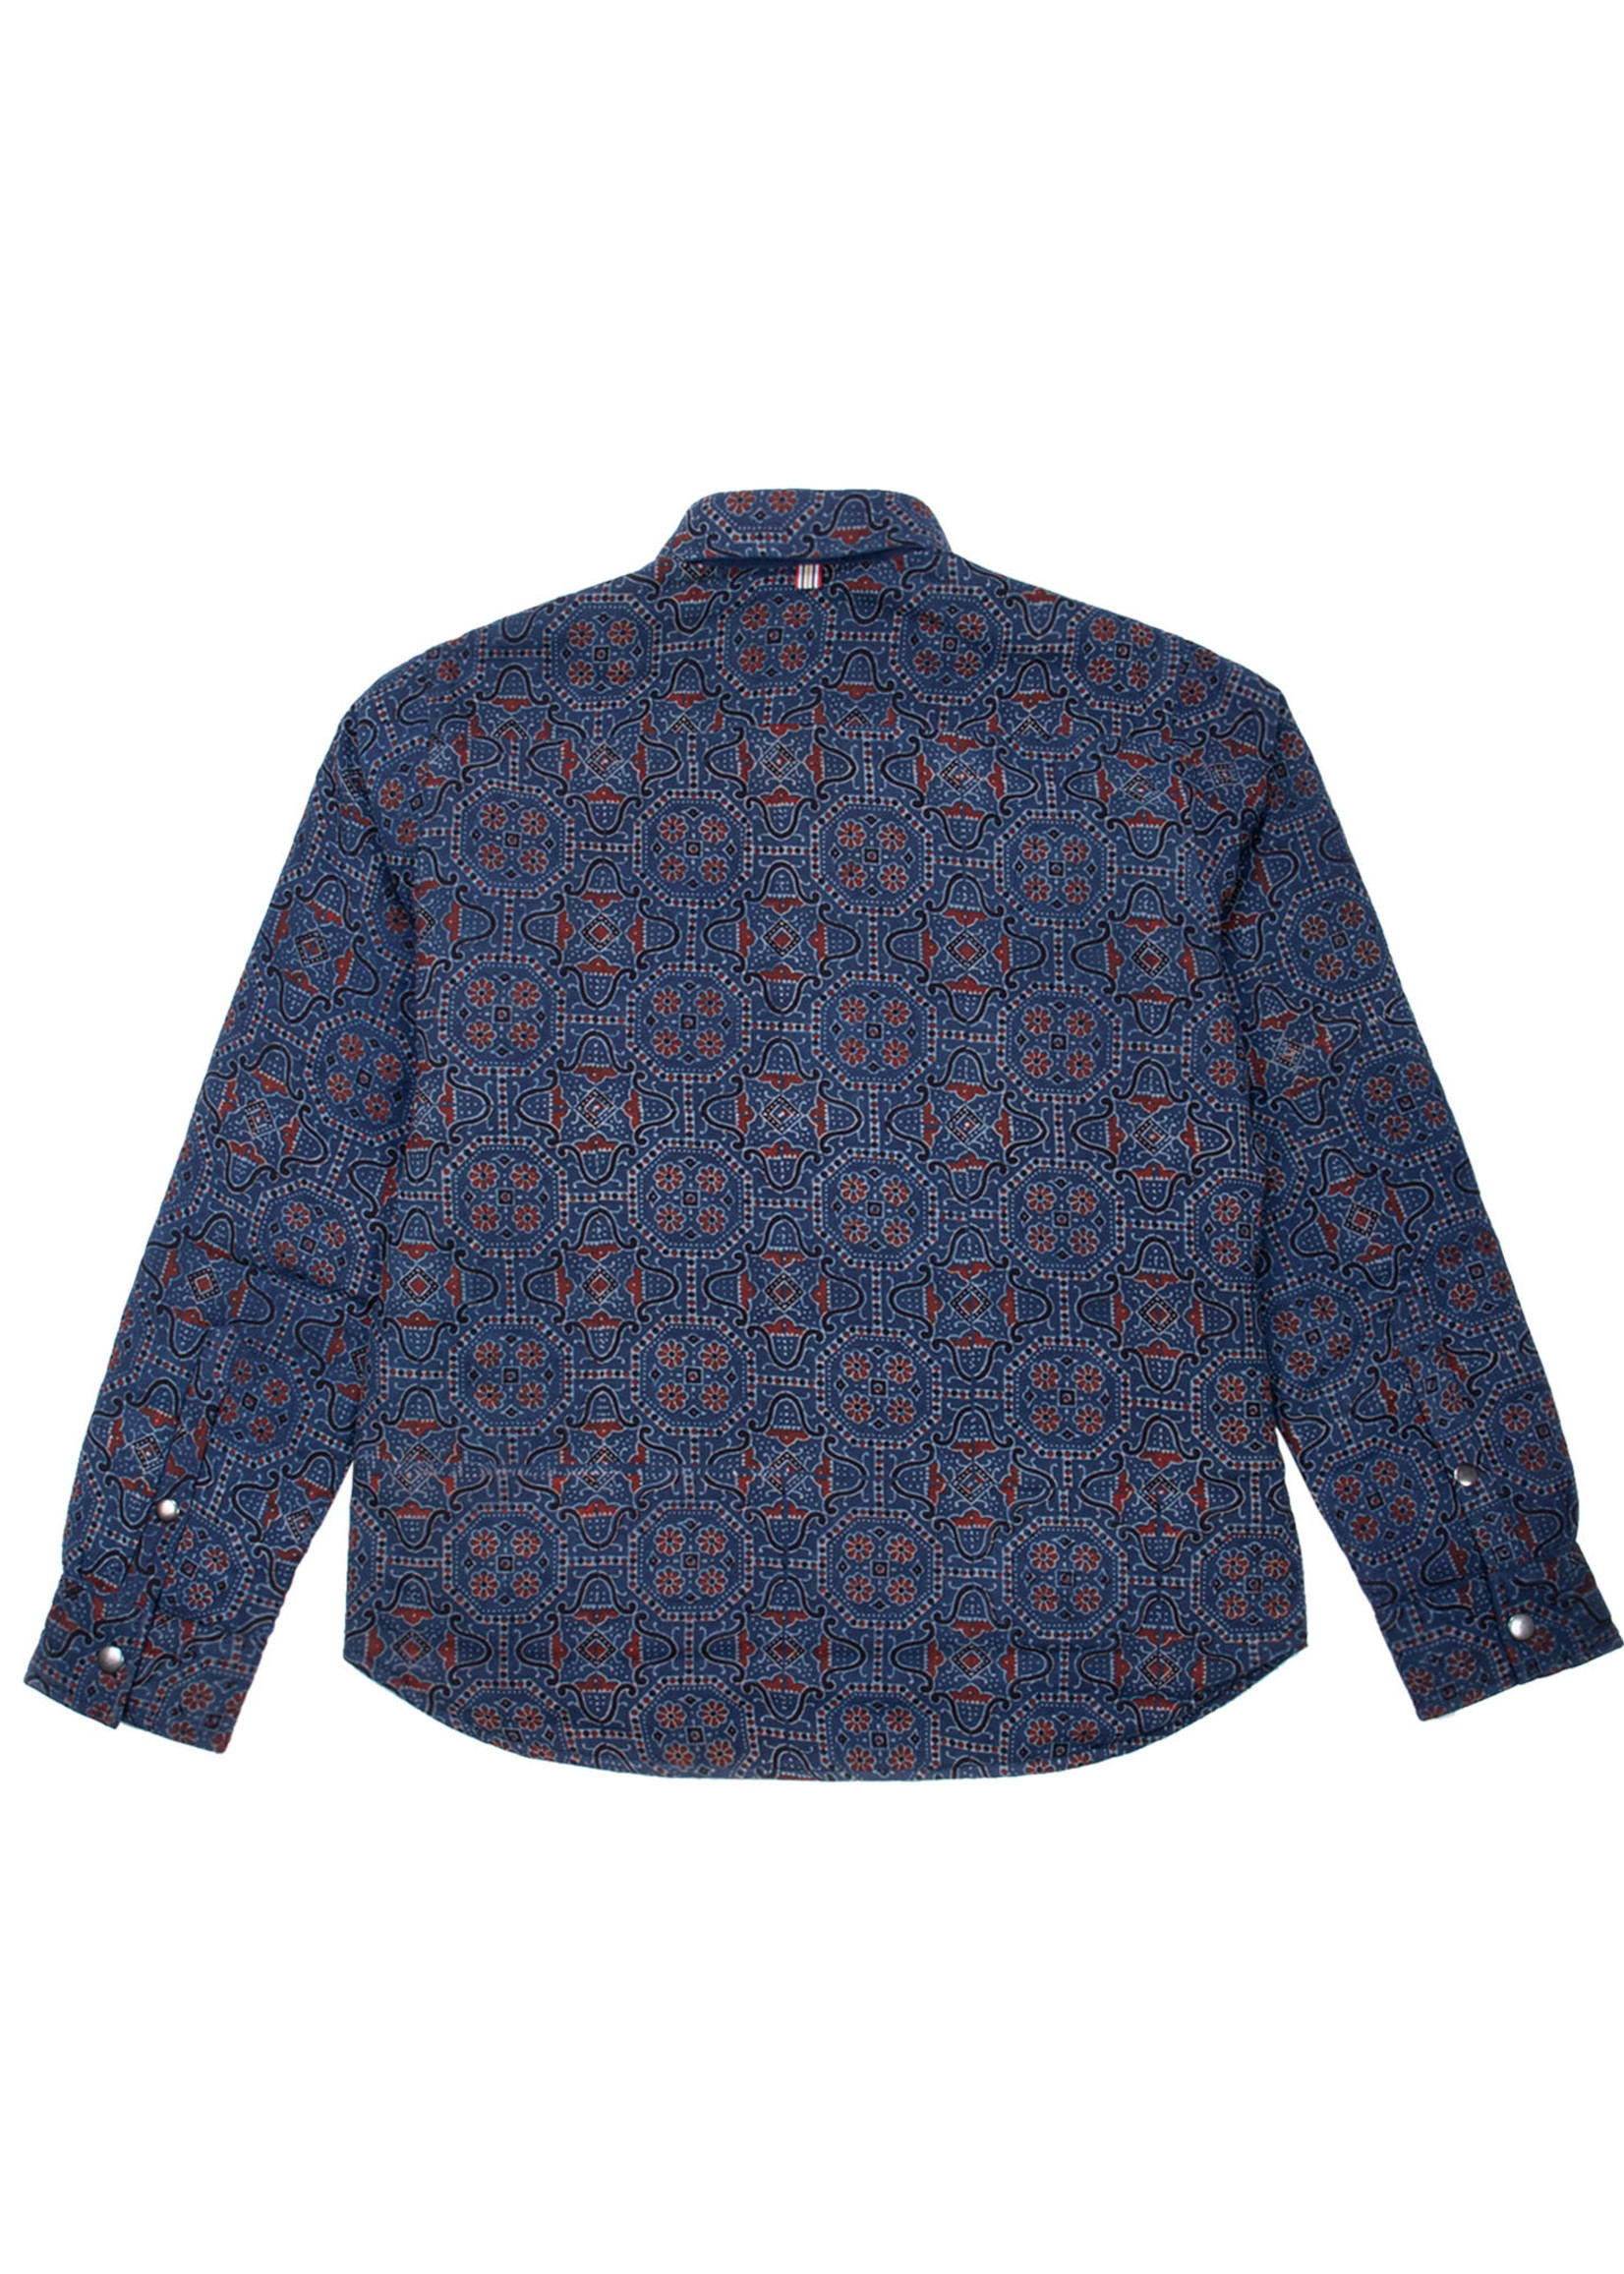 Kardo Kardo Woody Block Print Quilted Jacket